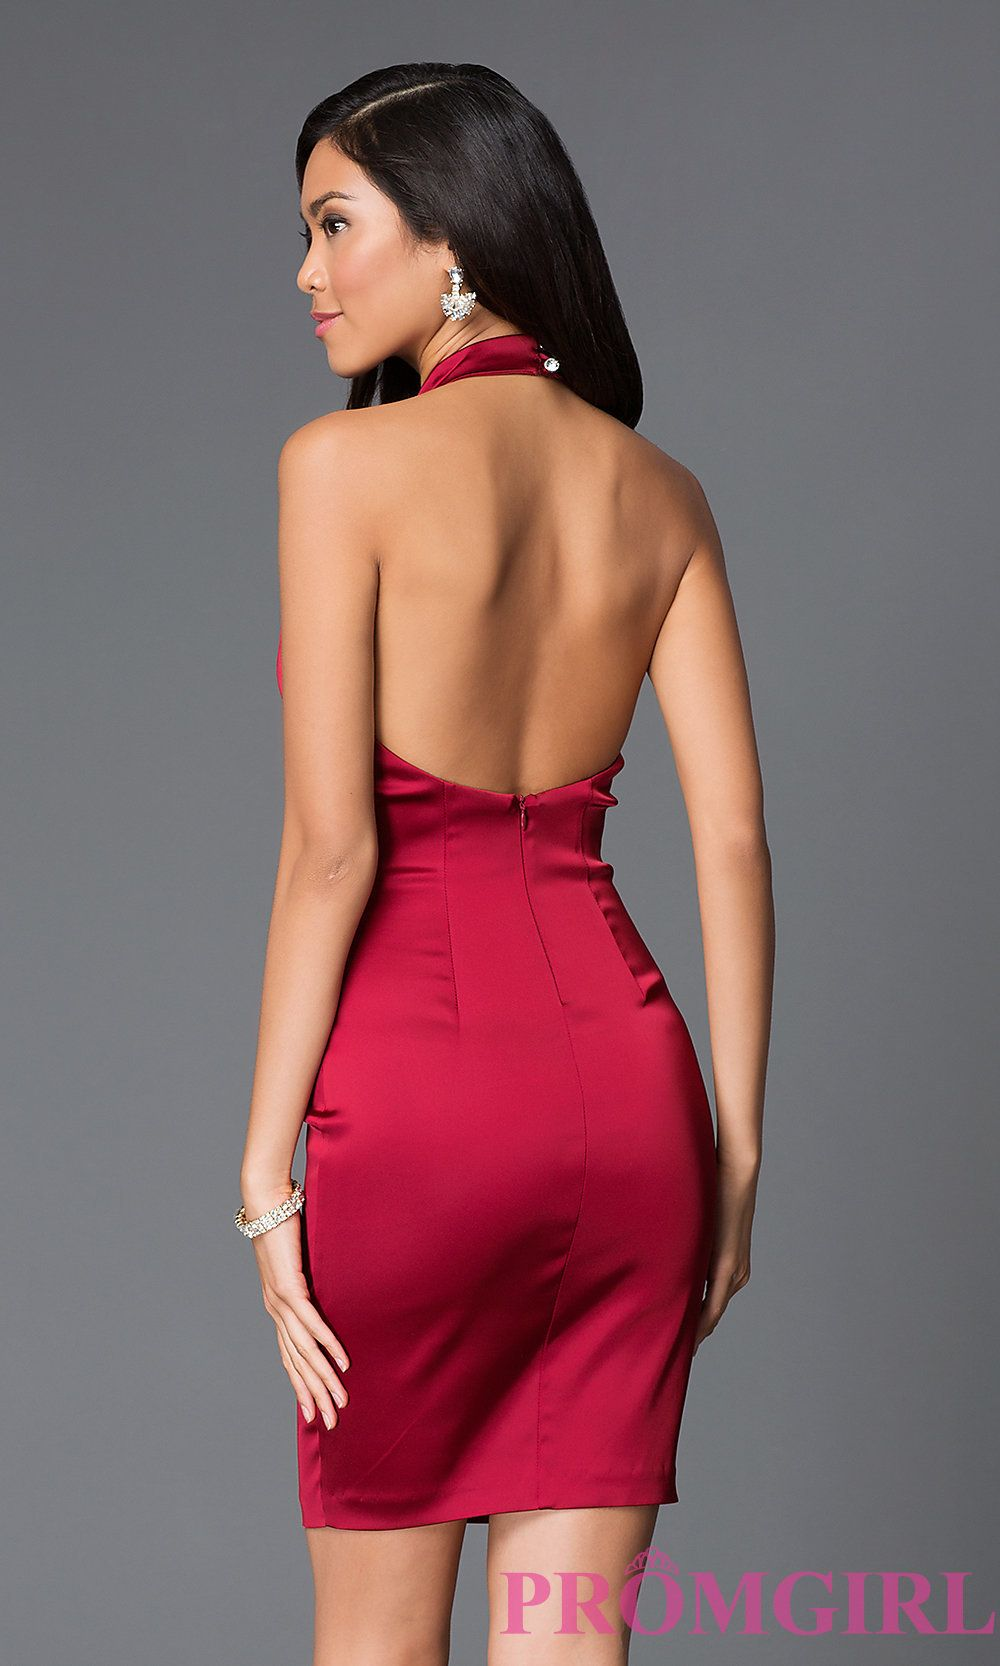 Pin On Bodycon Party Dresses Short Dresses [ 1666 x 1000 Pixel ]